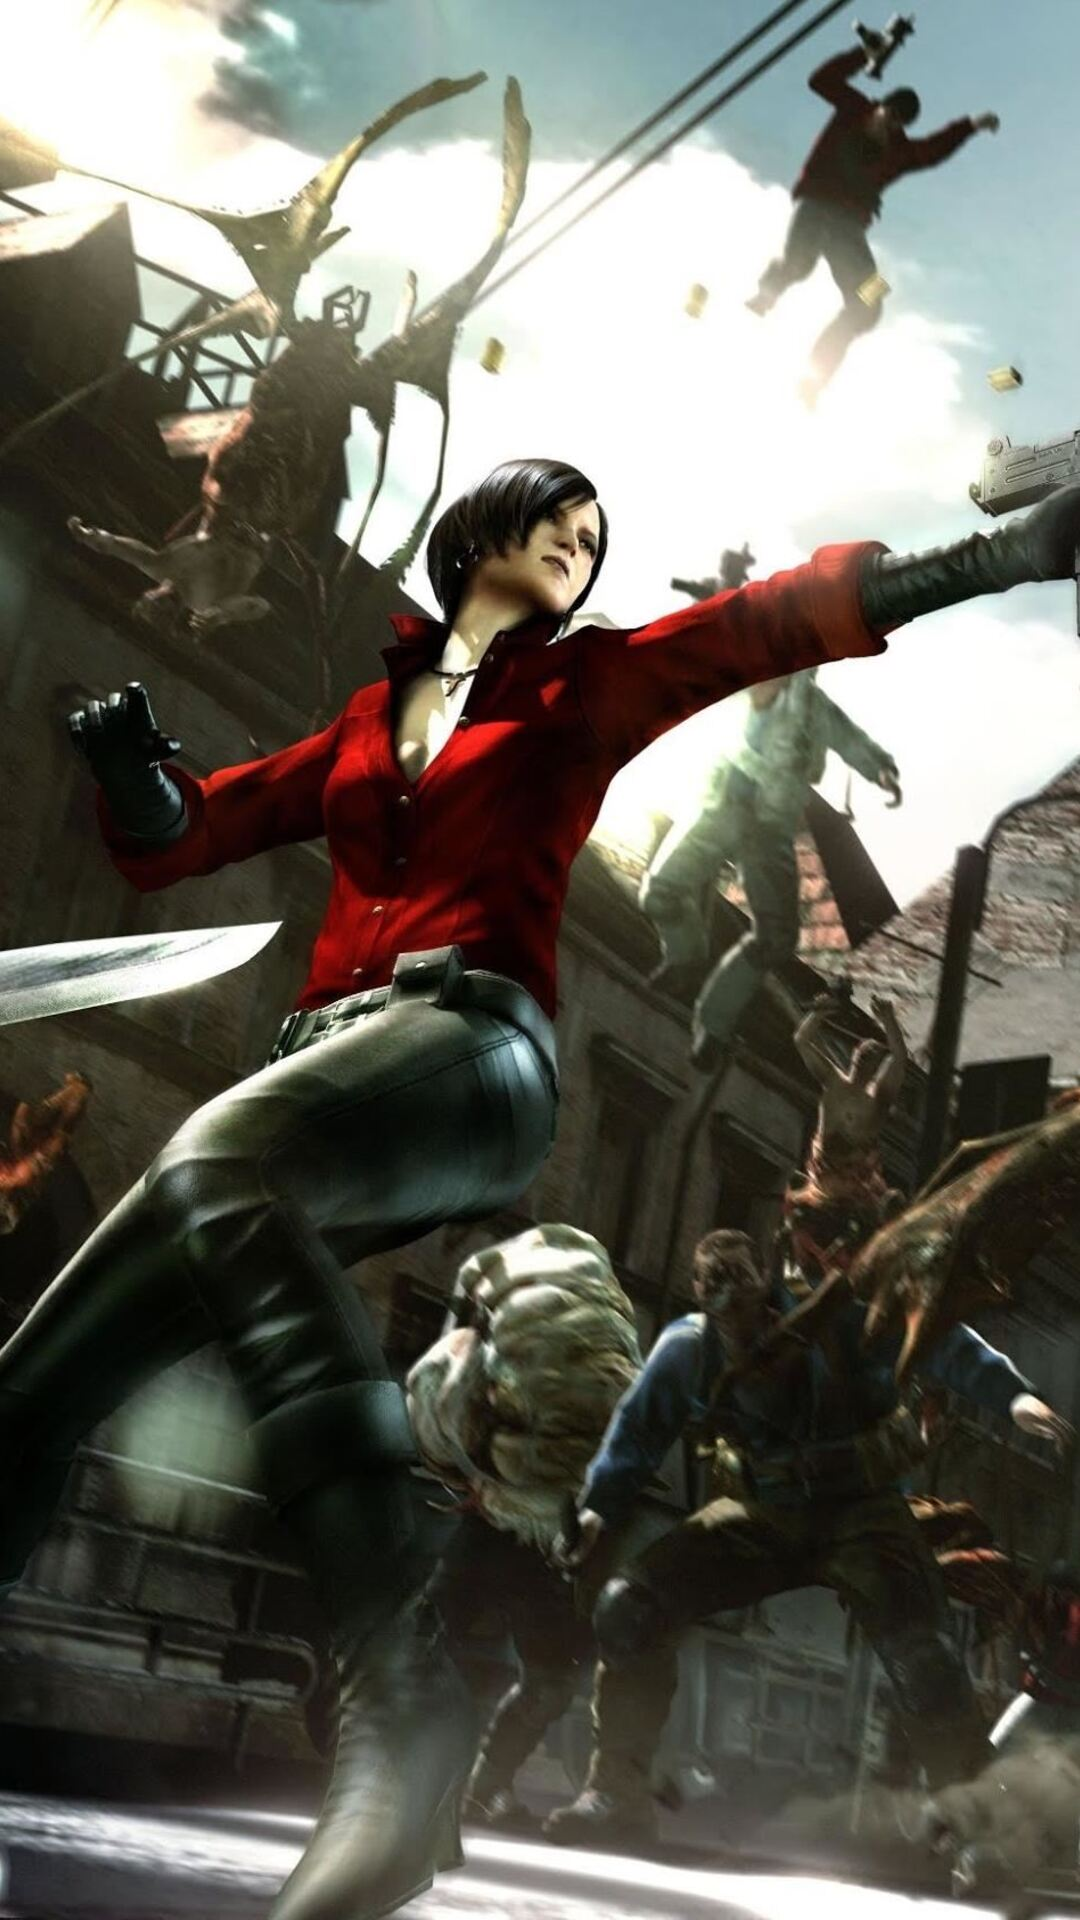 1080x1920 Resident Evil 7 Game Iphone 7,6s,6 Plus, Pixel ...